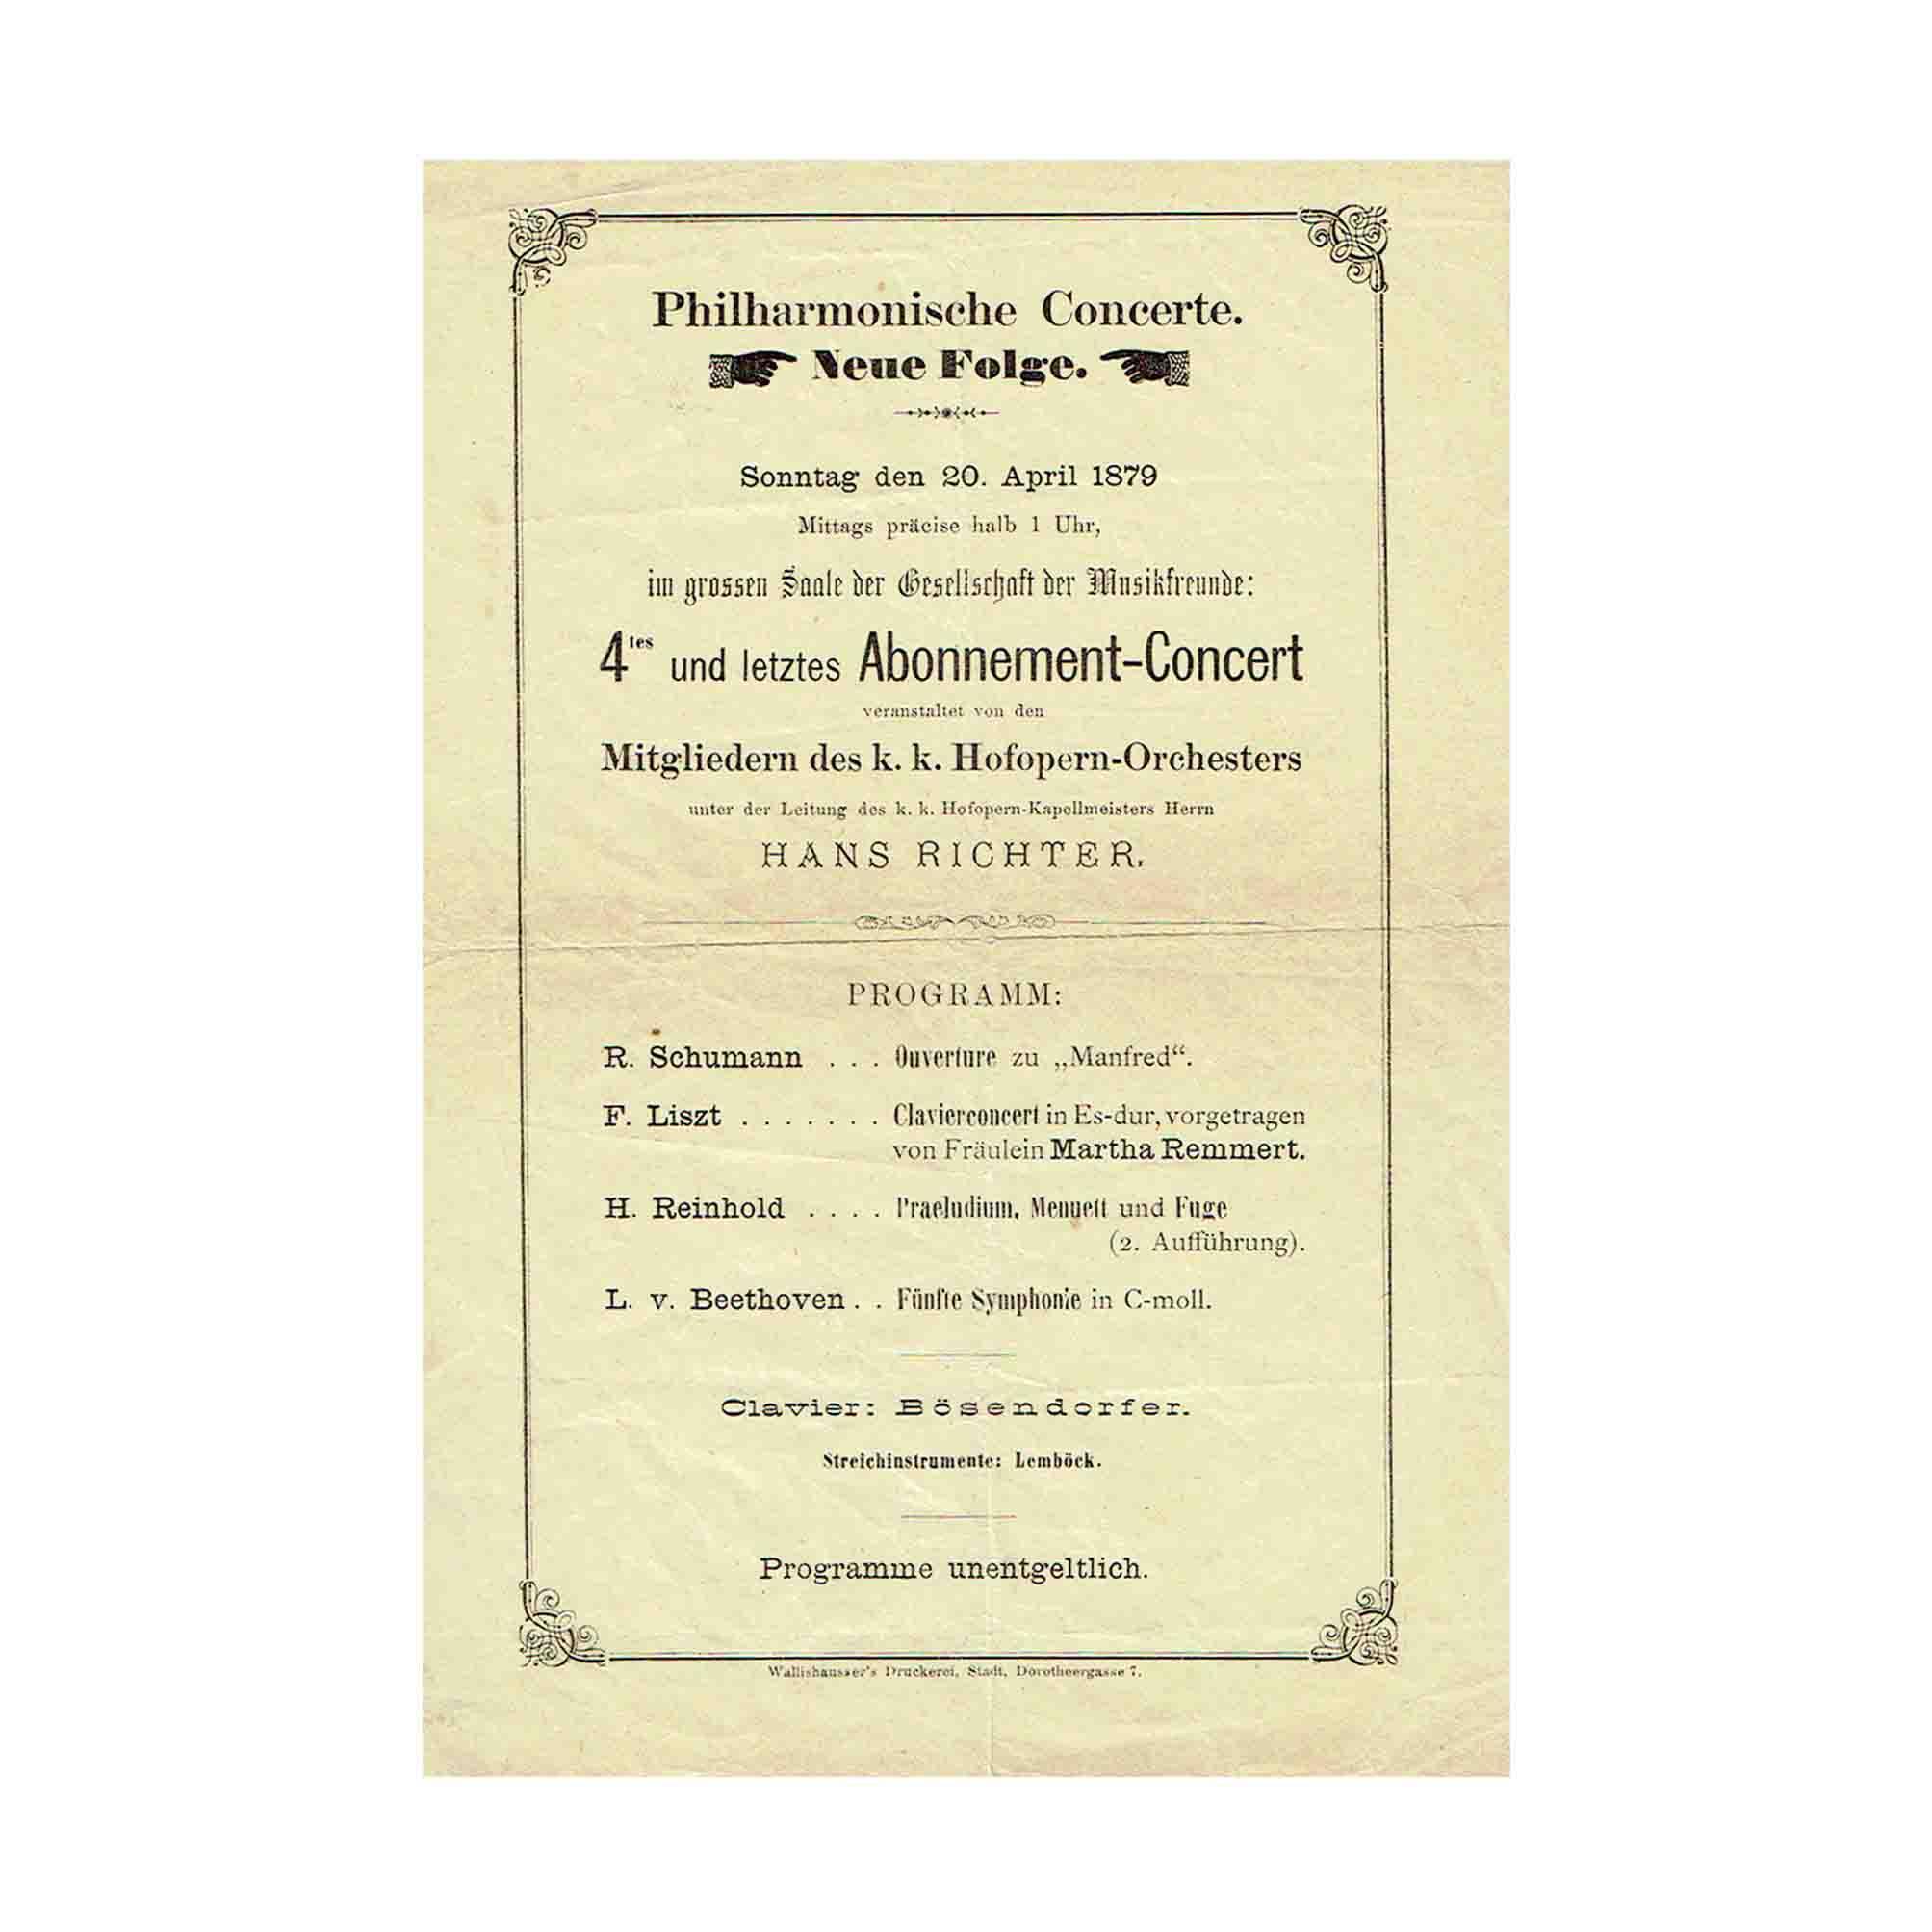 5480 Programmblatt Musikverein Konzert Musikverein 20. April 1879 A N